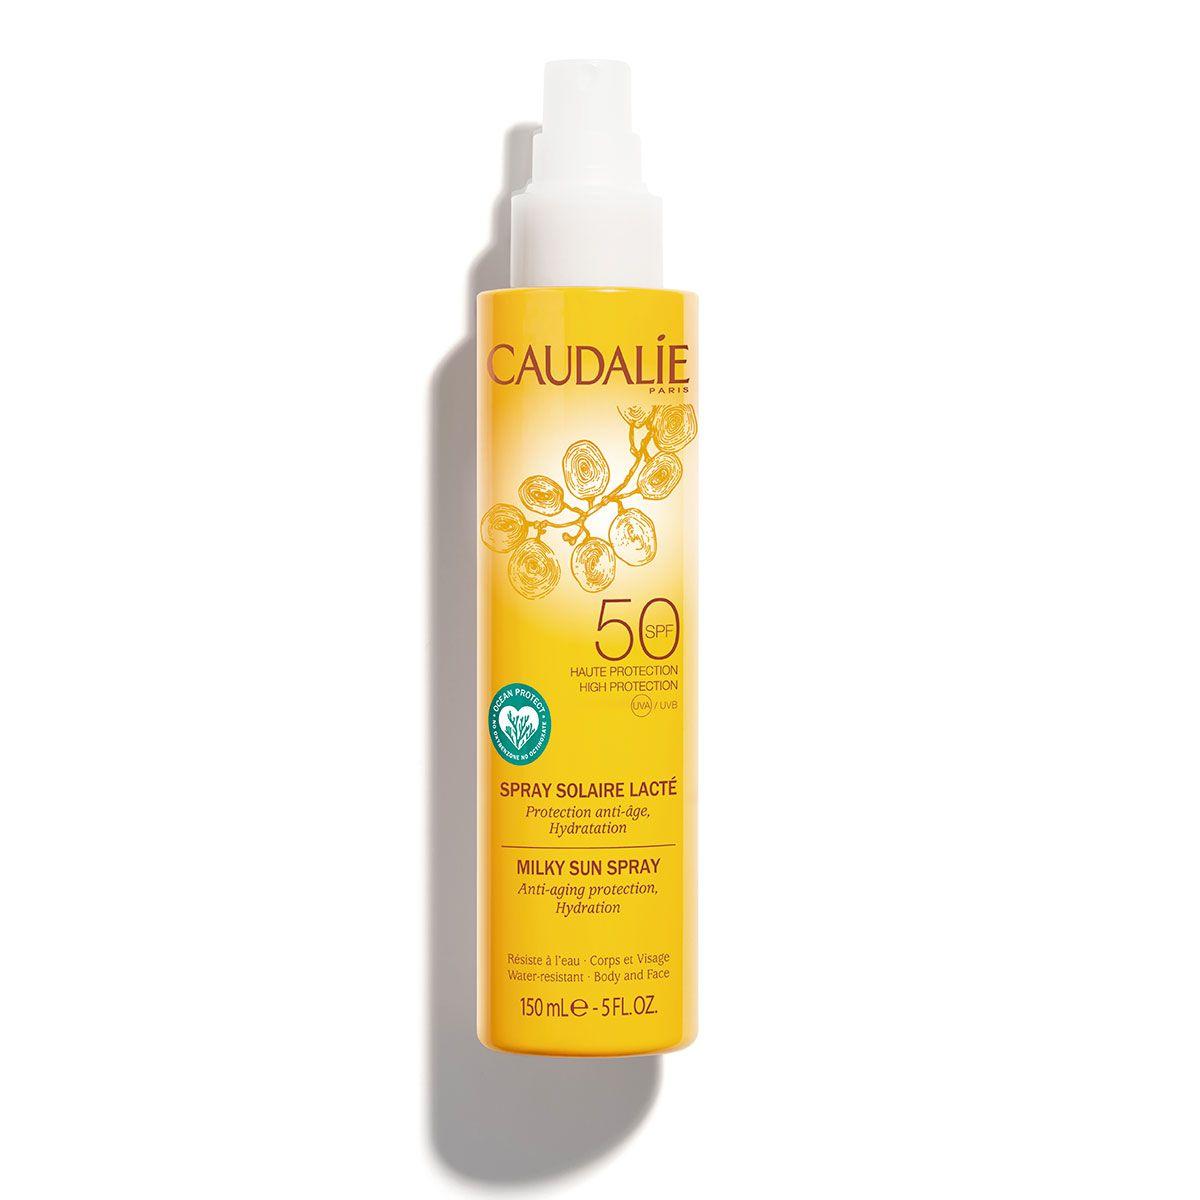 CAUDALIE CREMA SOLARE SPRAY SPF 50 - Farmacento